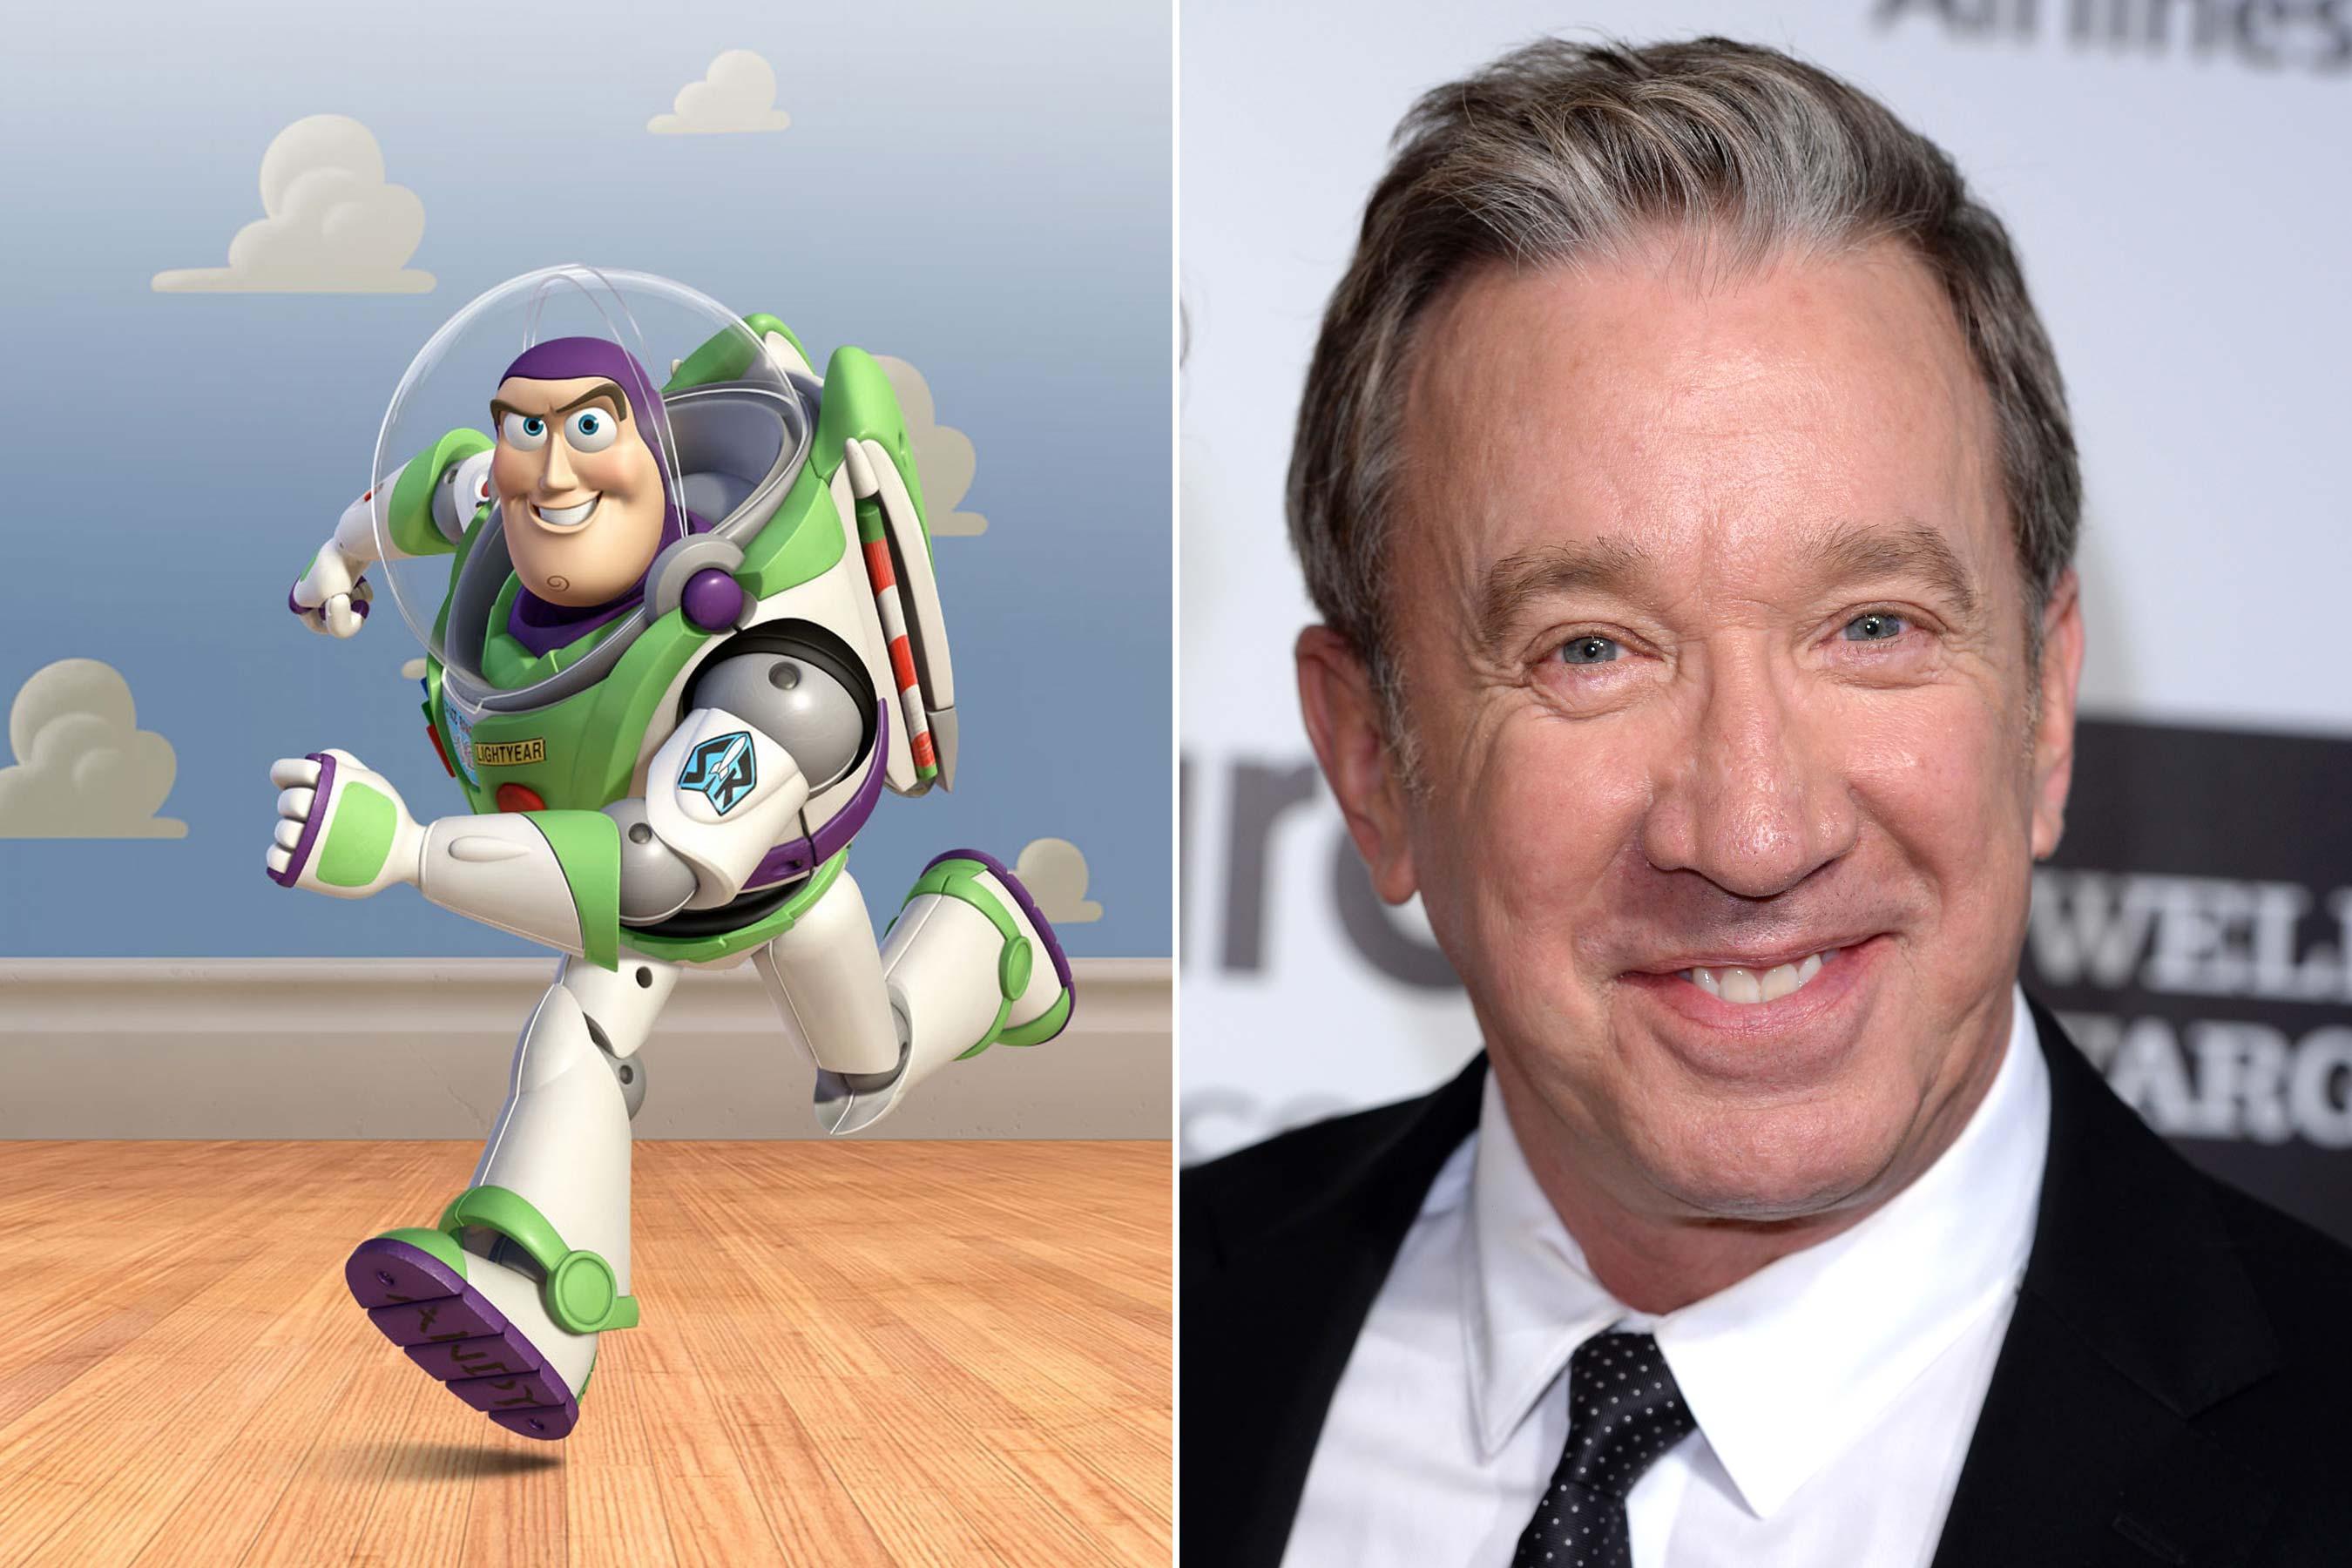 Buzz Lightyear - Tim Allen (Toy Story 1-3)